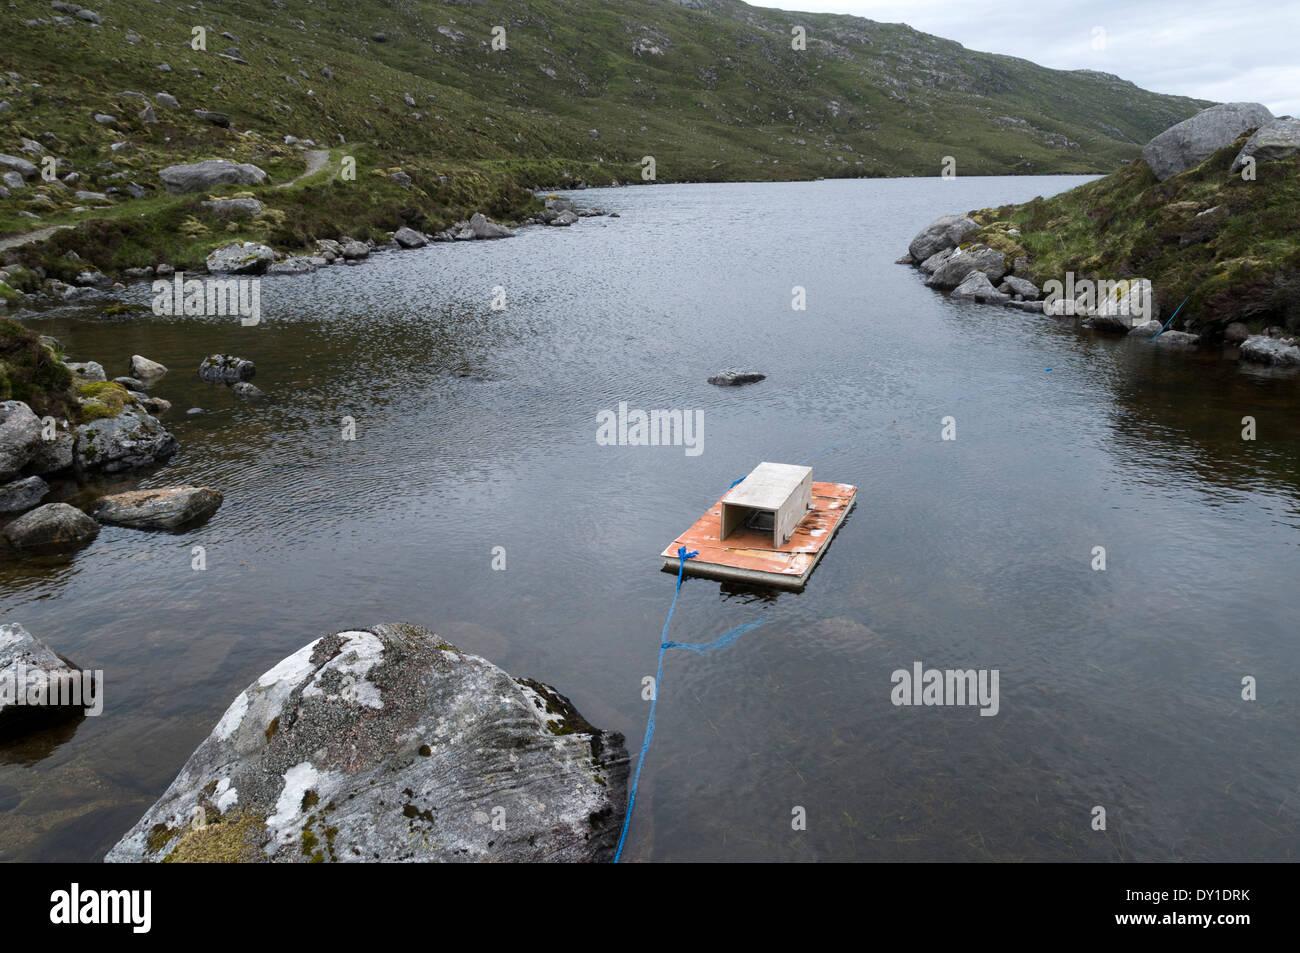 Mink Raft on Loch Aiseaphat, Gleann Chliostair in the North Harris hills, Western Isles, Scotland, UK. - Stock Image